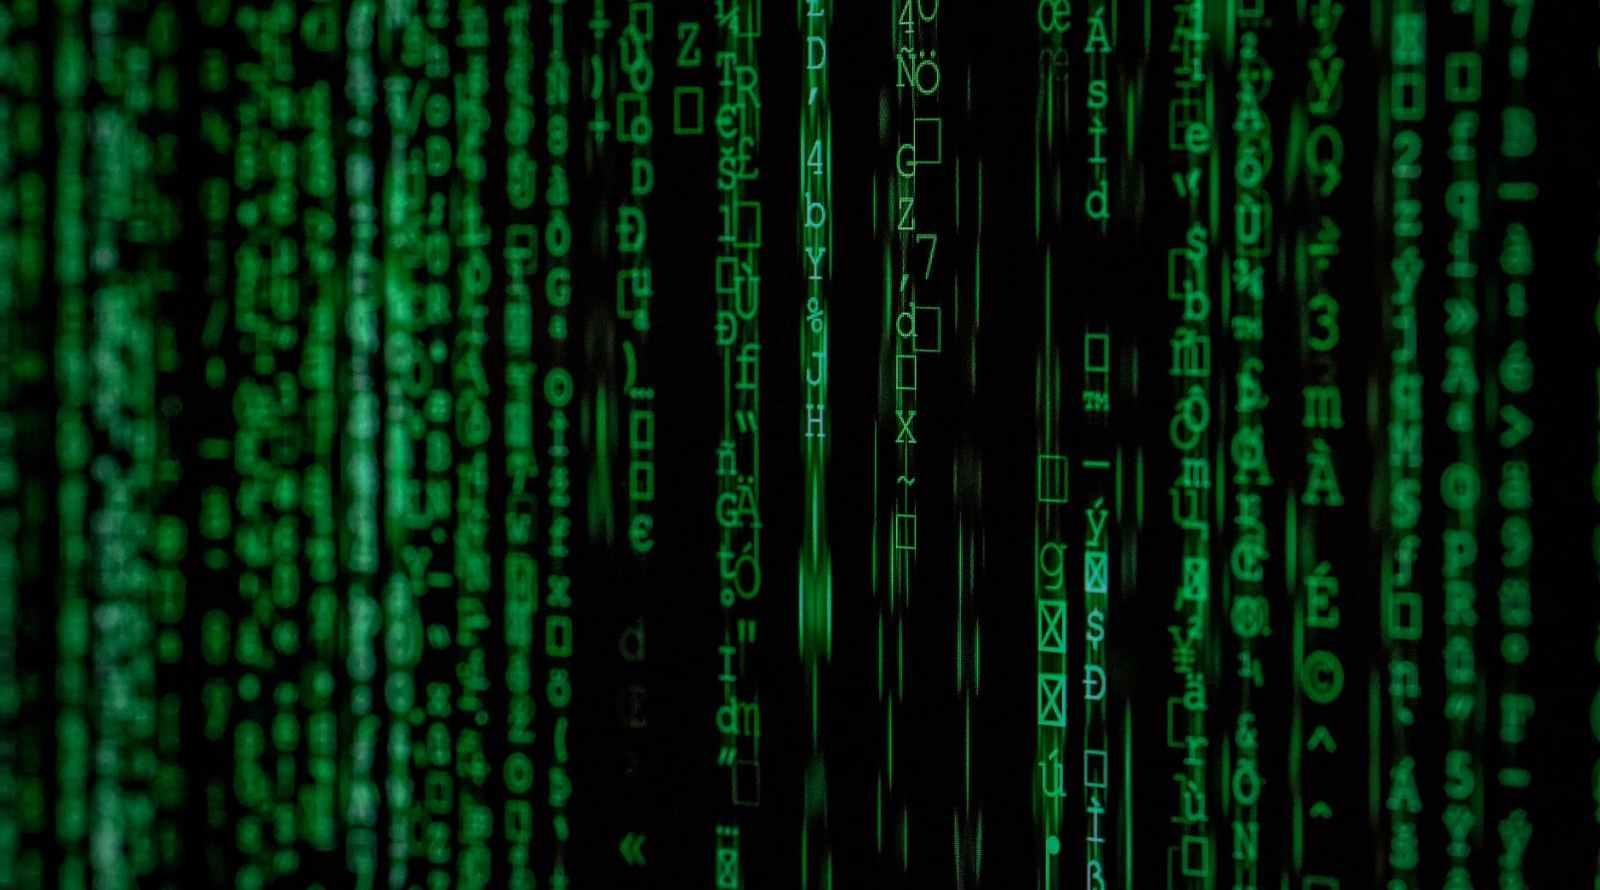 1-15 September 2020 Cyber Attacks Timeline